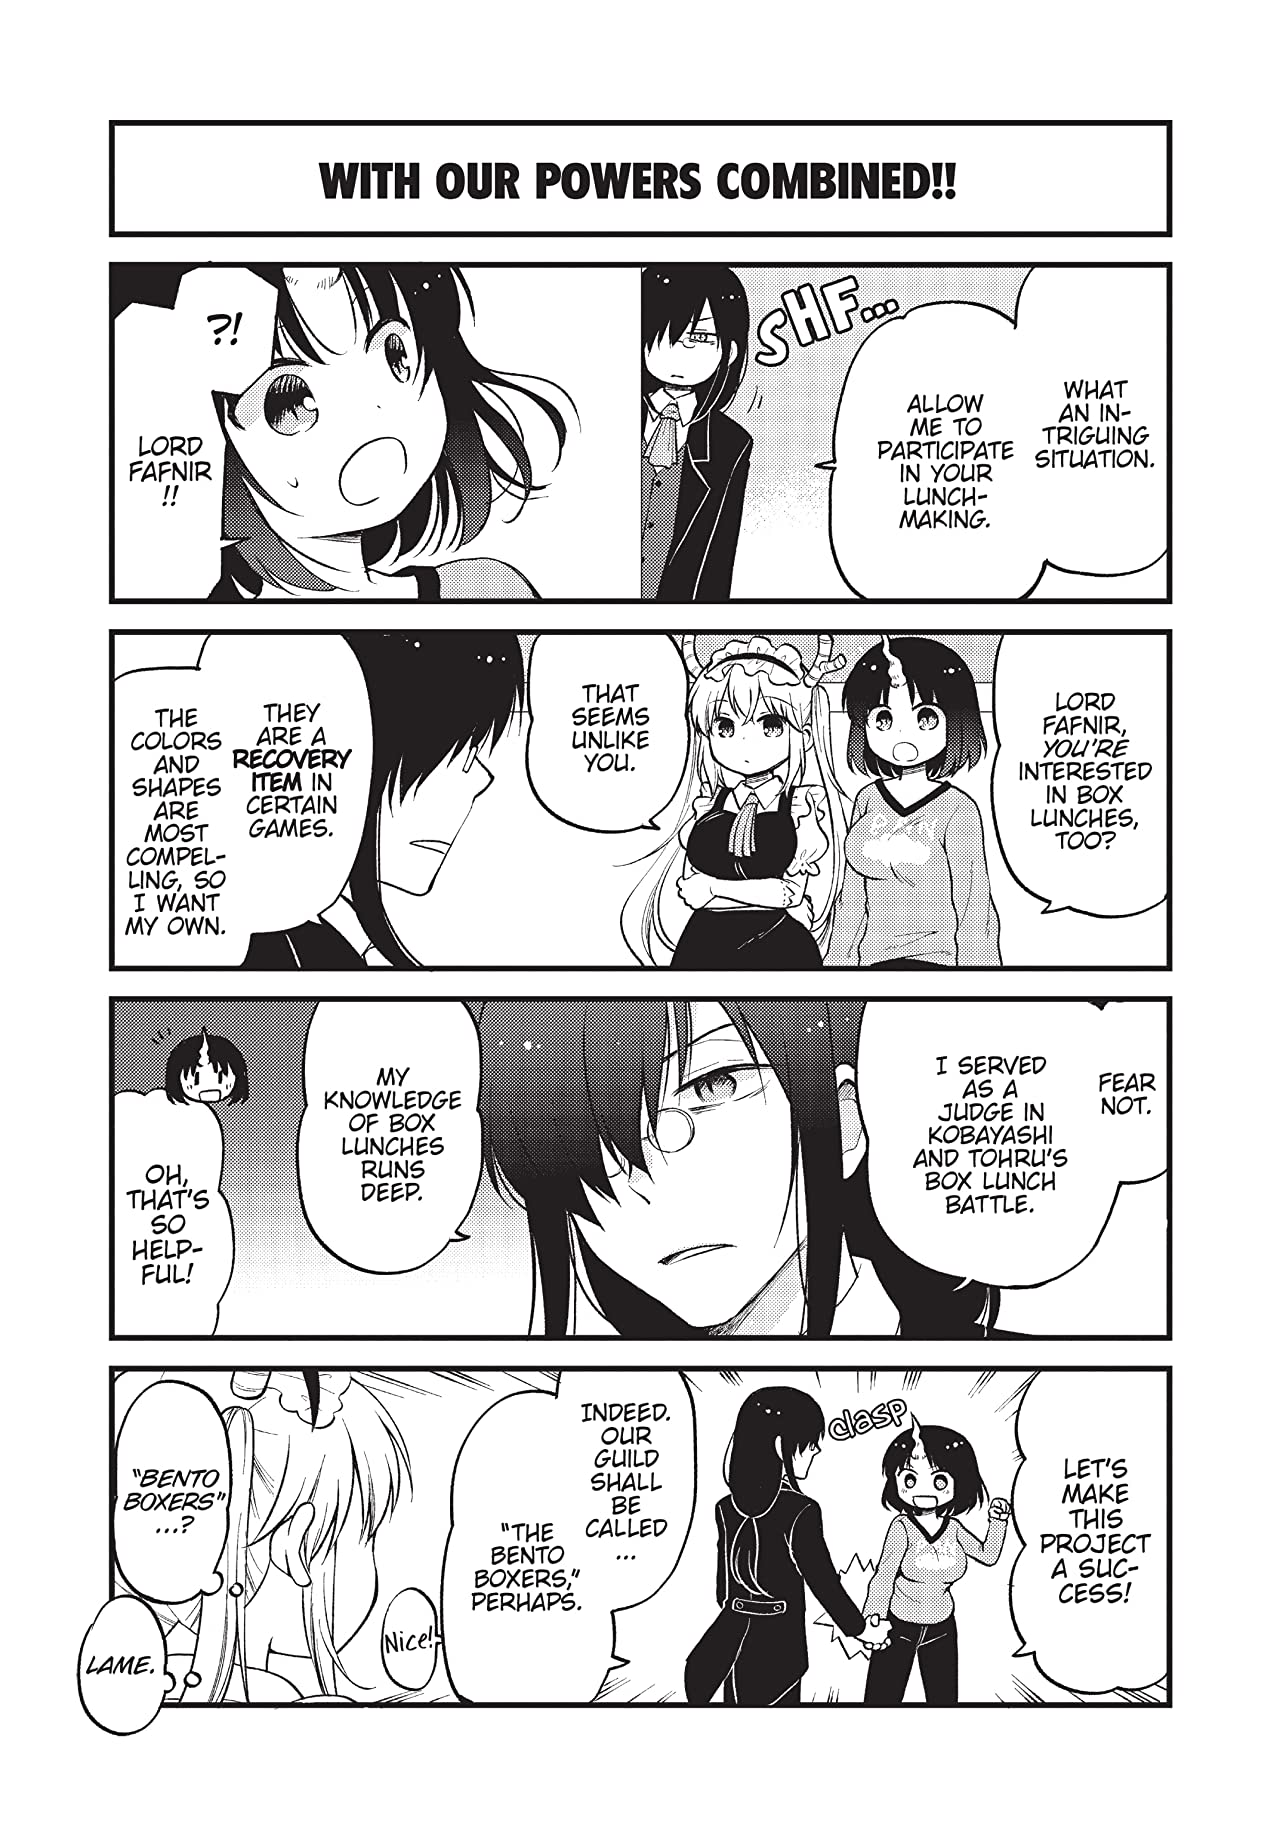 Miss Kobayashi's Dragon Maid: Elma's Office Lady Diary Vol. 2